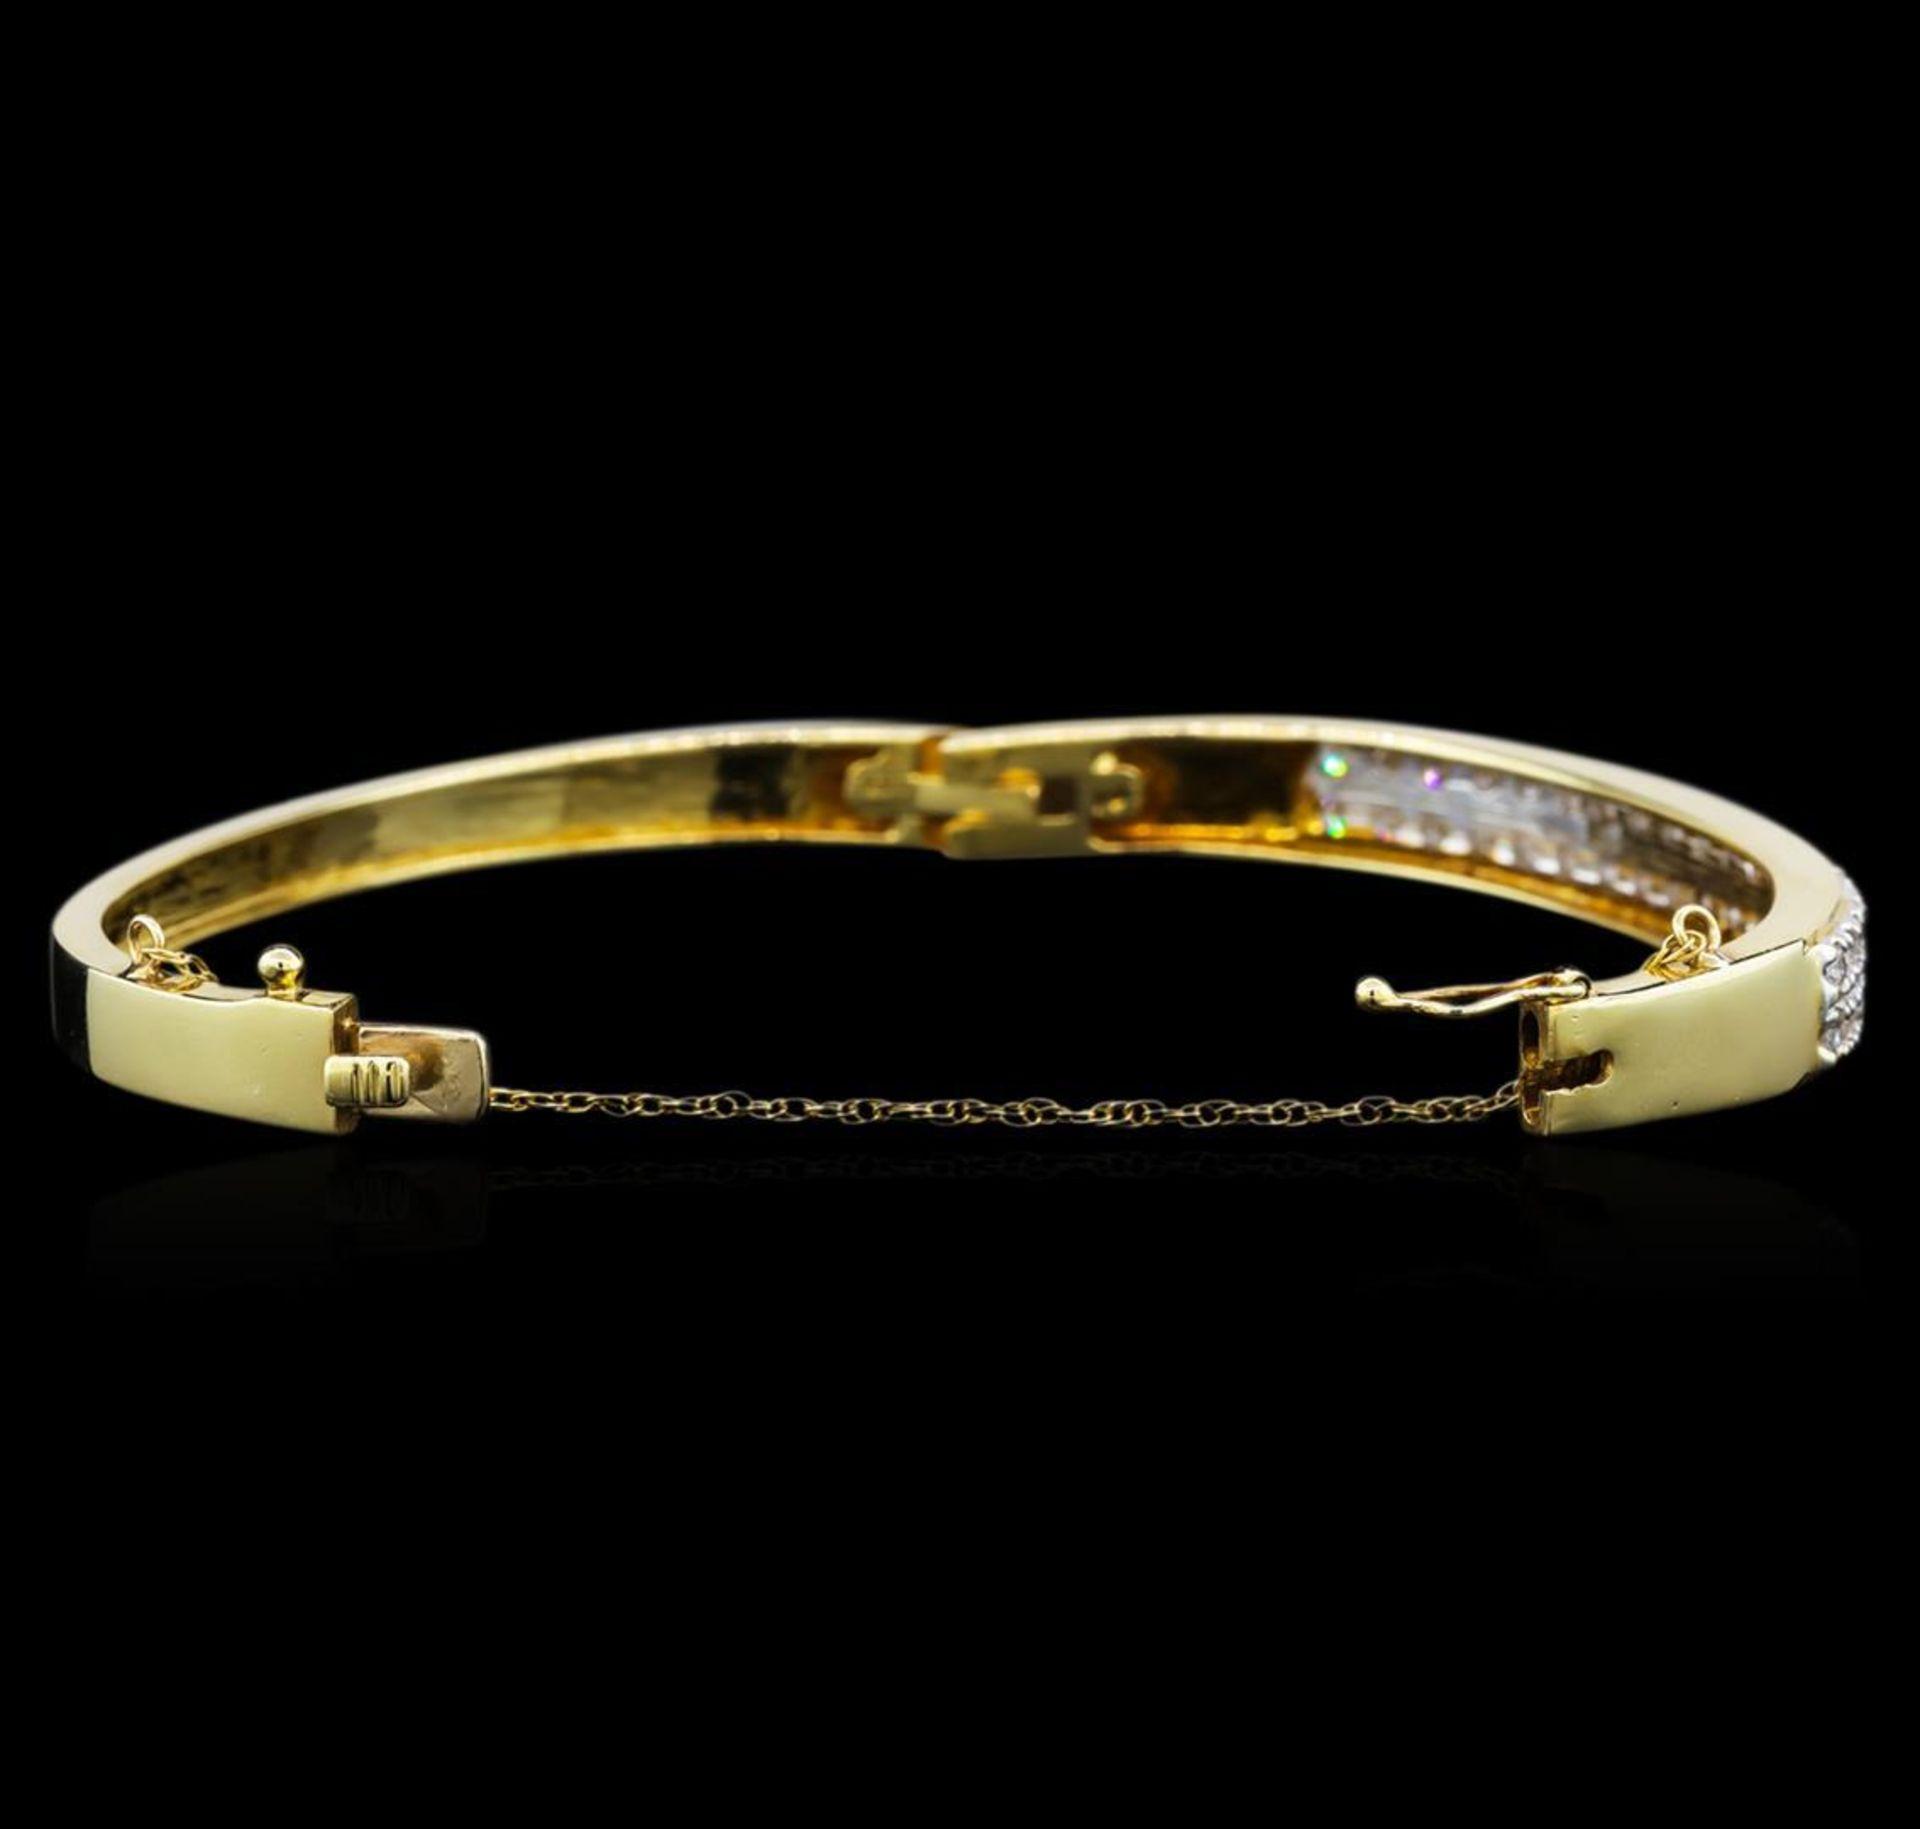 14KT Yellow Gold 2.28 ctw Diamond Bracelet - Image 3 of 4